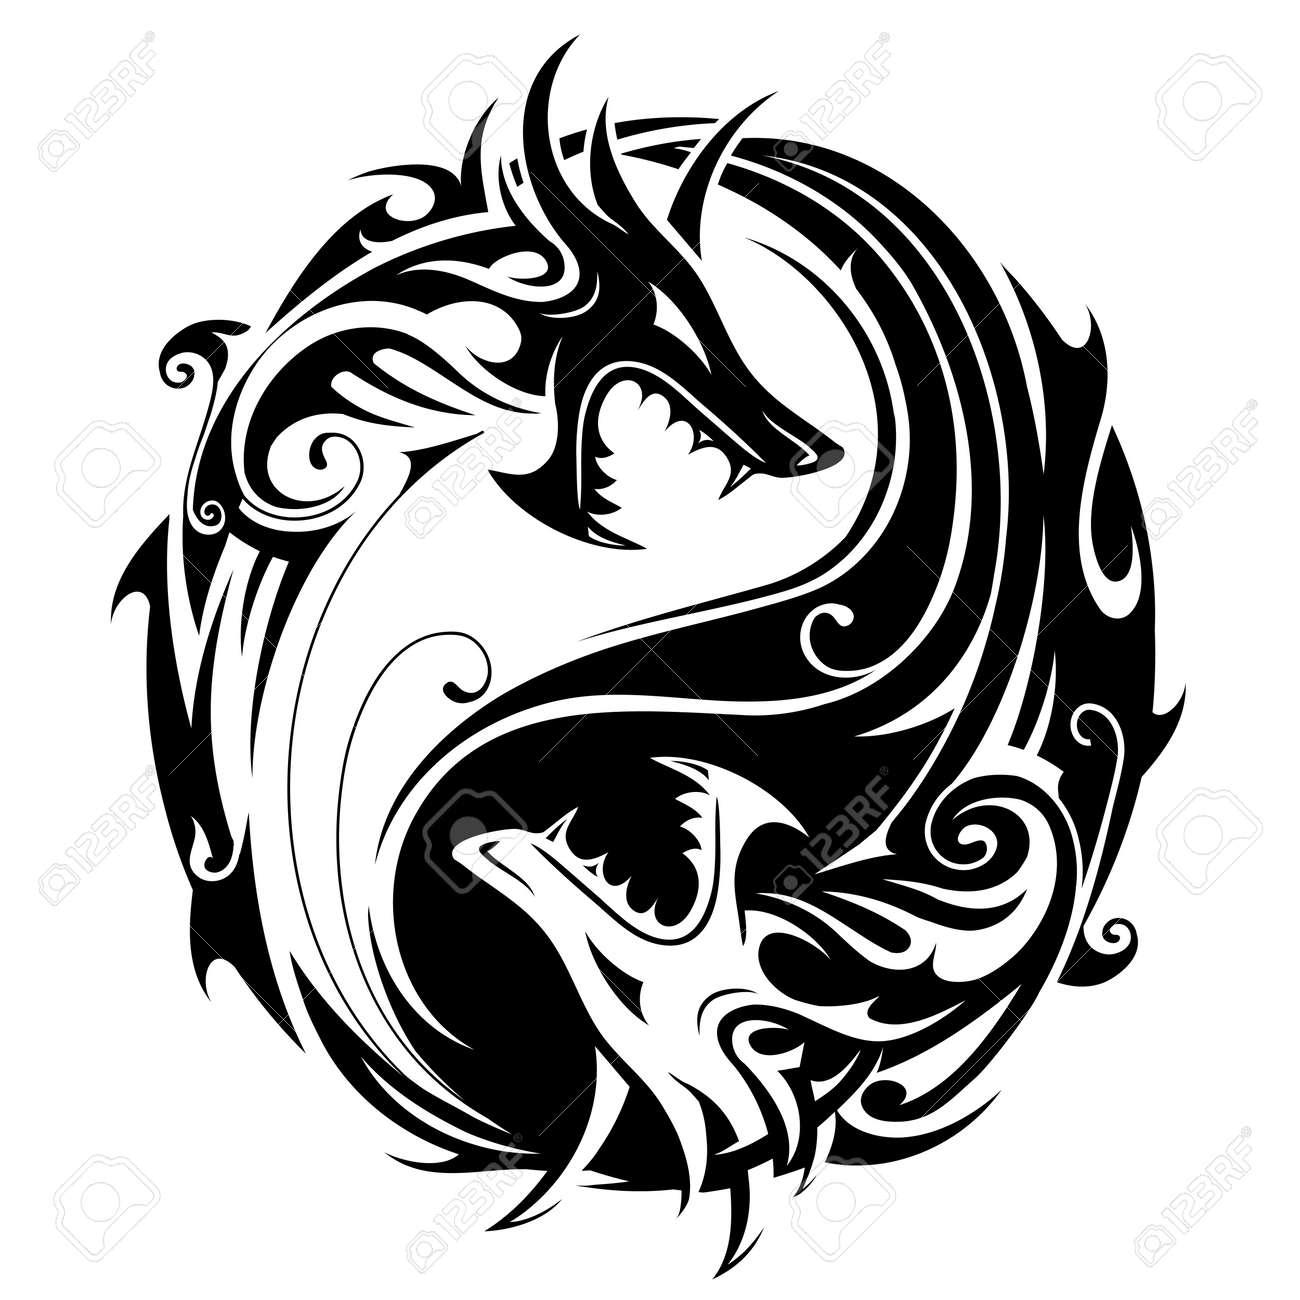 Yin Yang tattoo symbol shaped as two fighting dragons - 71934606